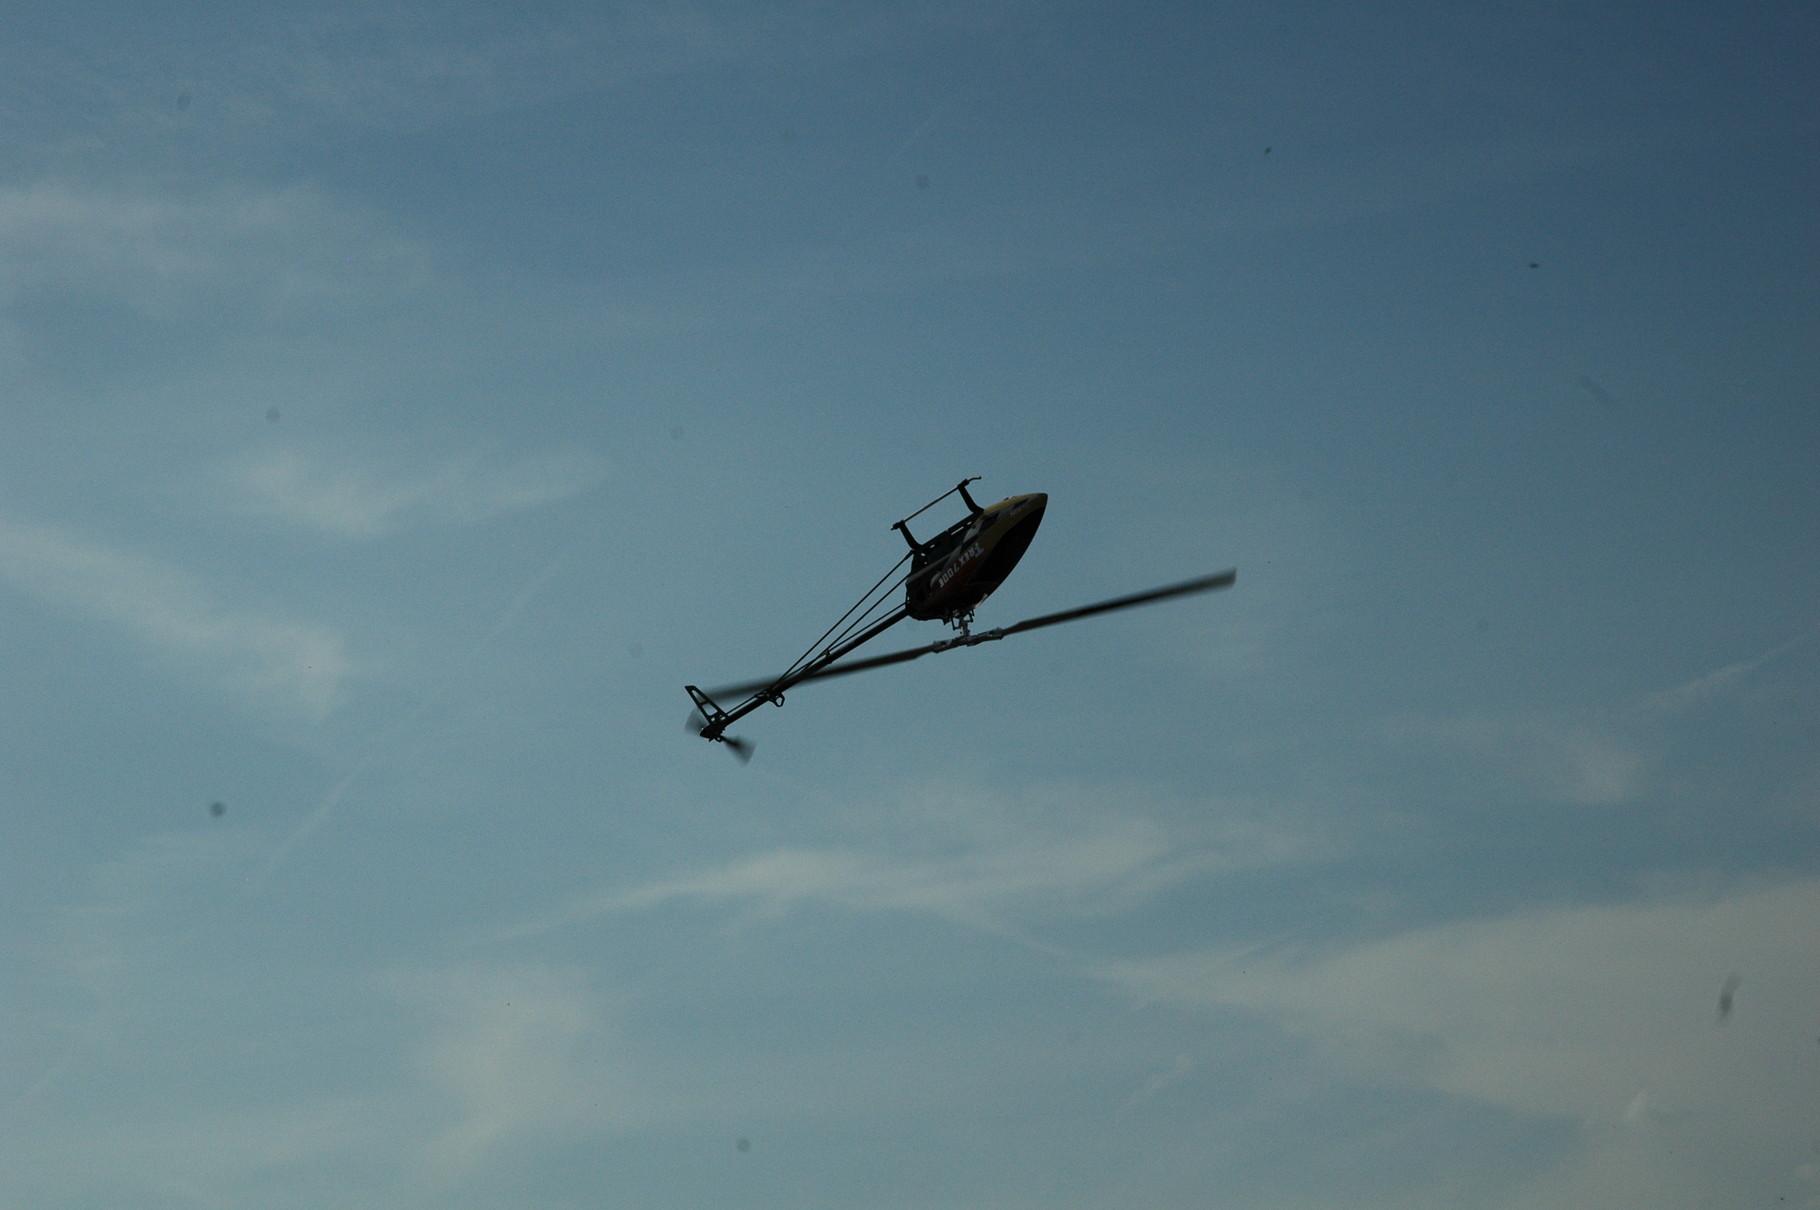 Kopfüberflug Show